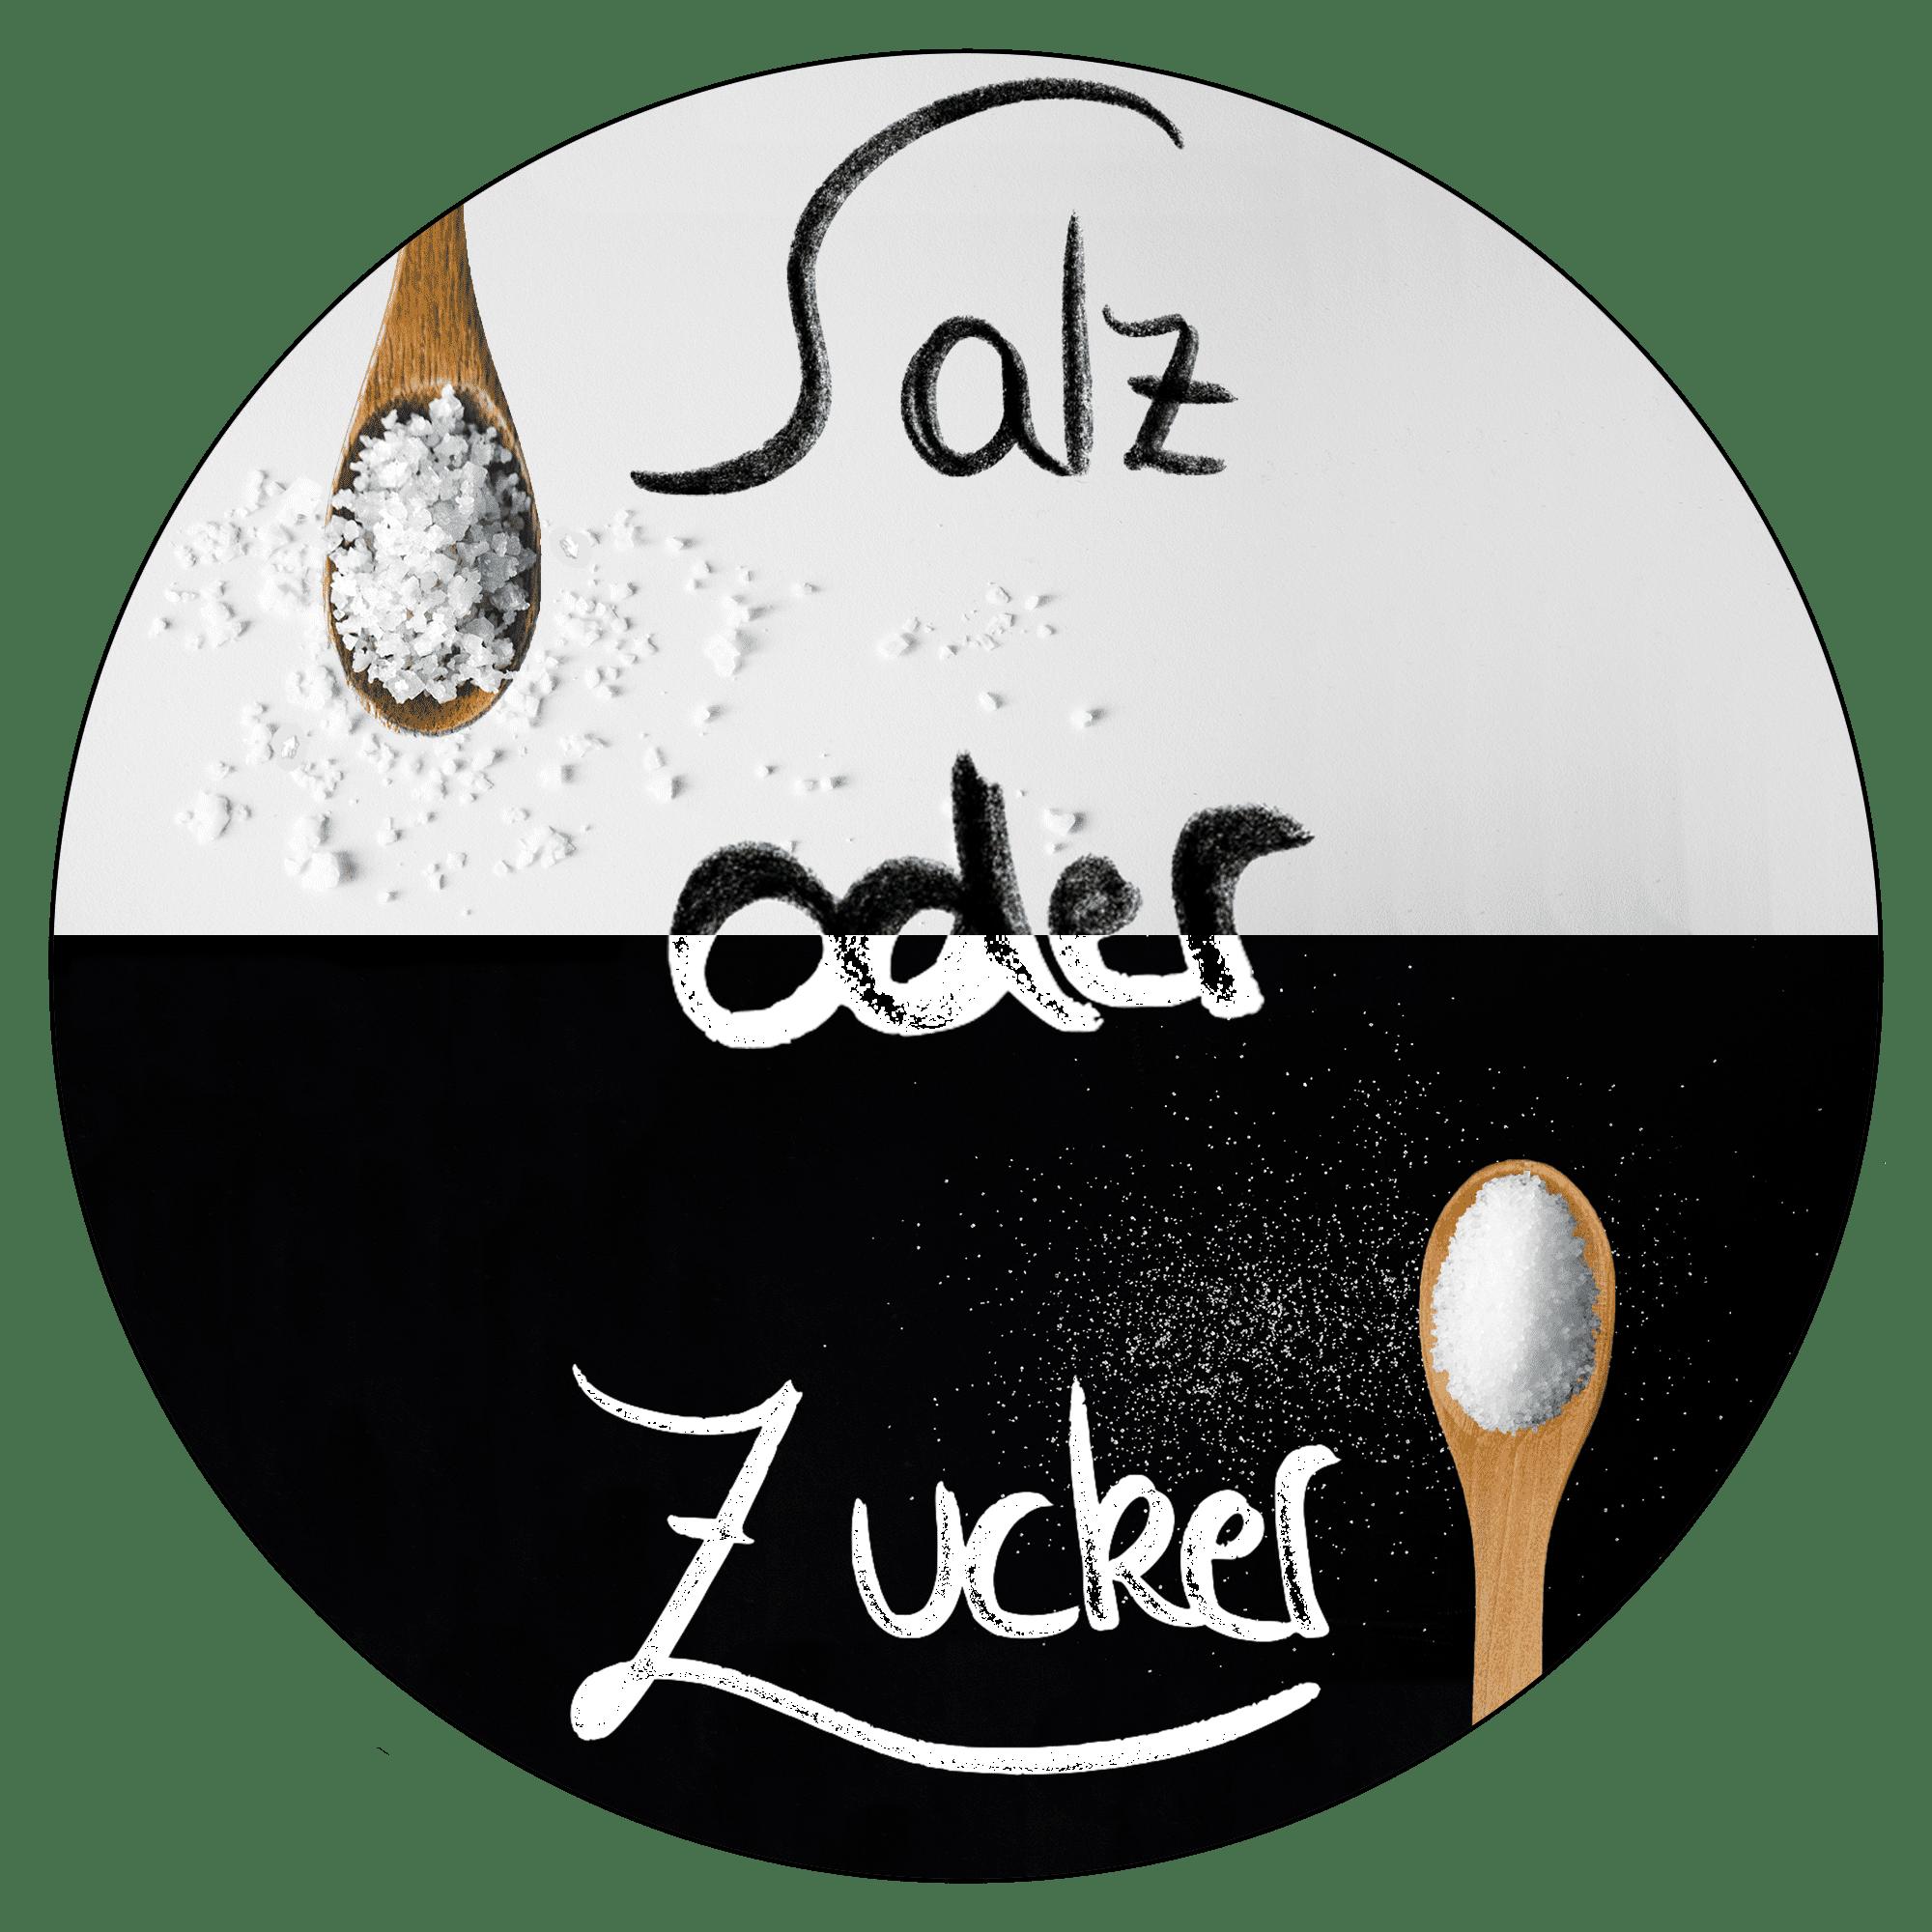 Salz oder Zucker Kopie schnittware